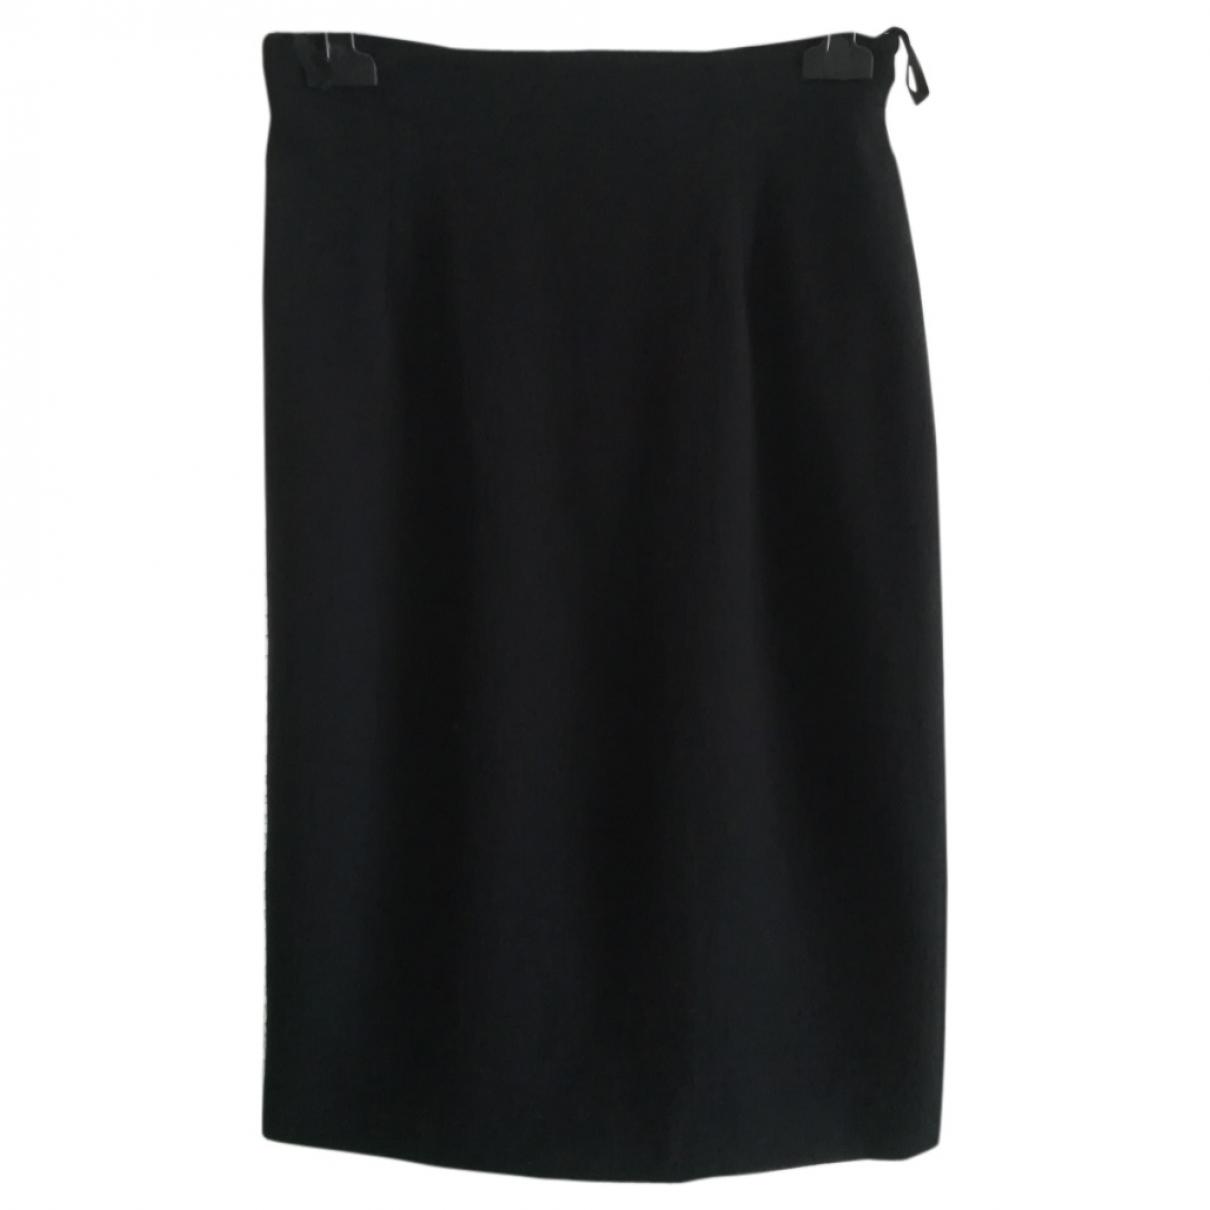 Karl Lagerfeld \N Black Wool skirt for Women 44 IT